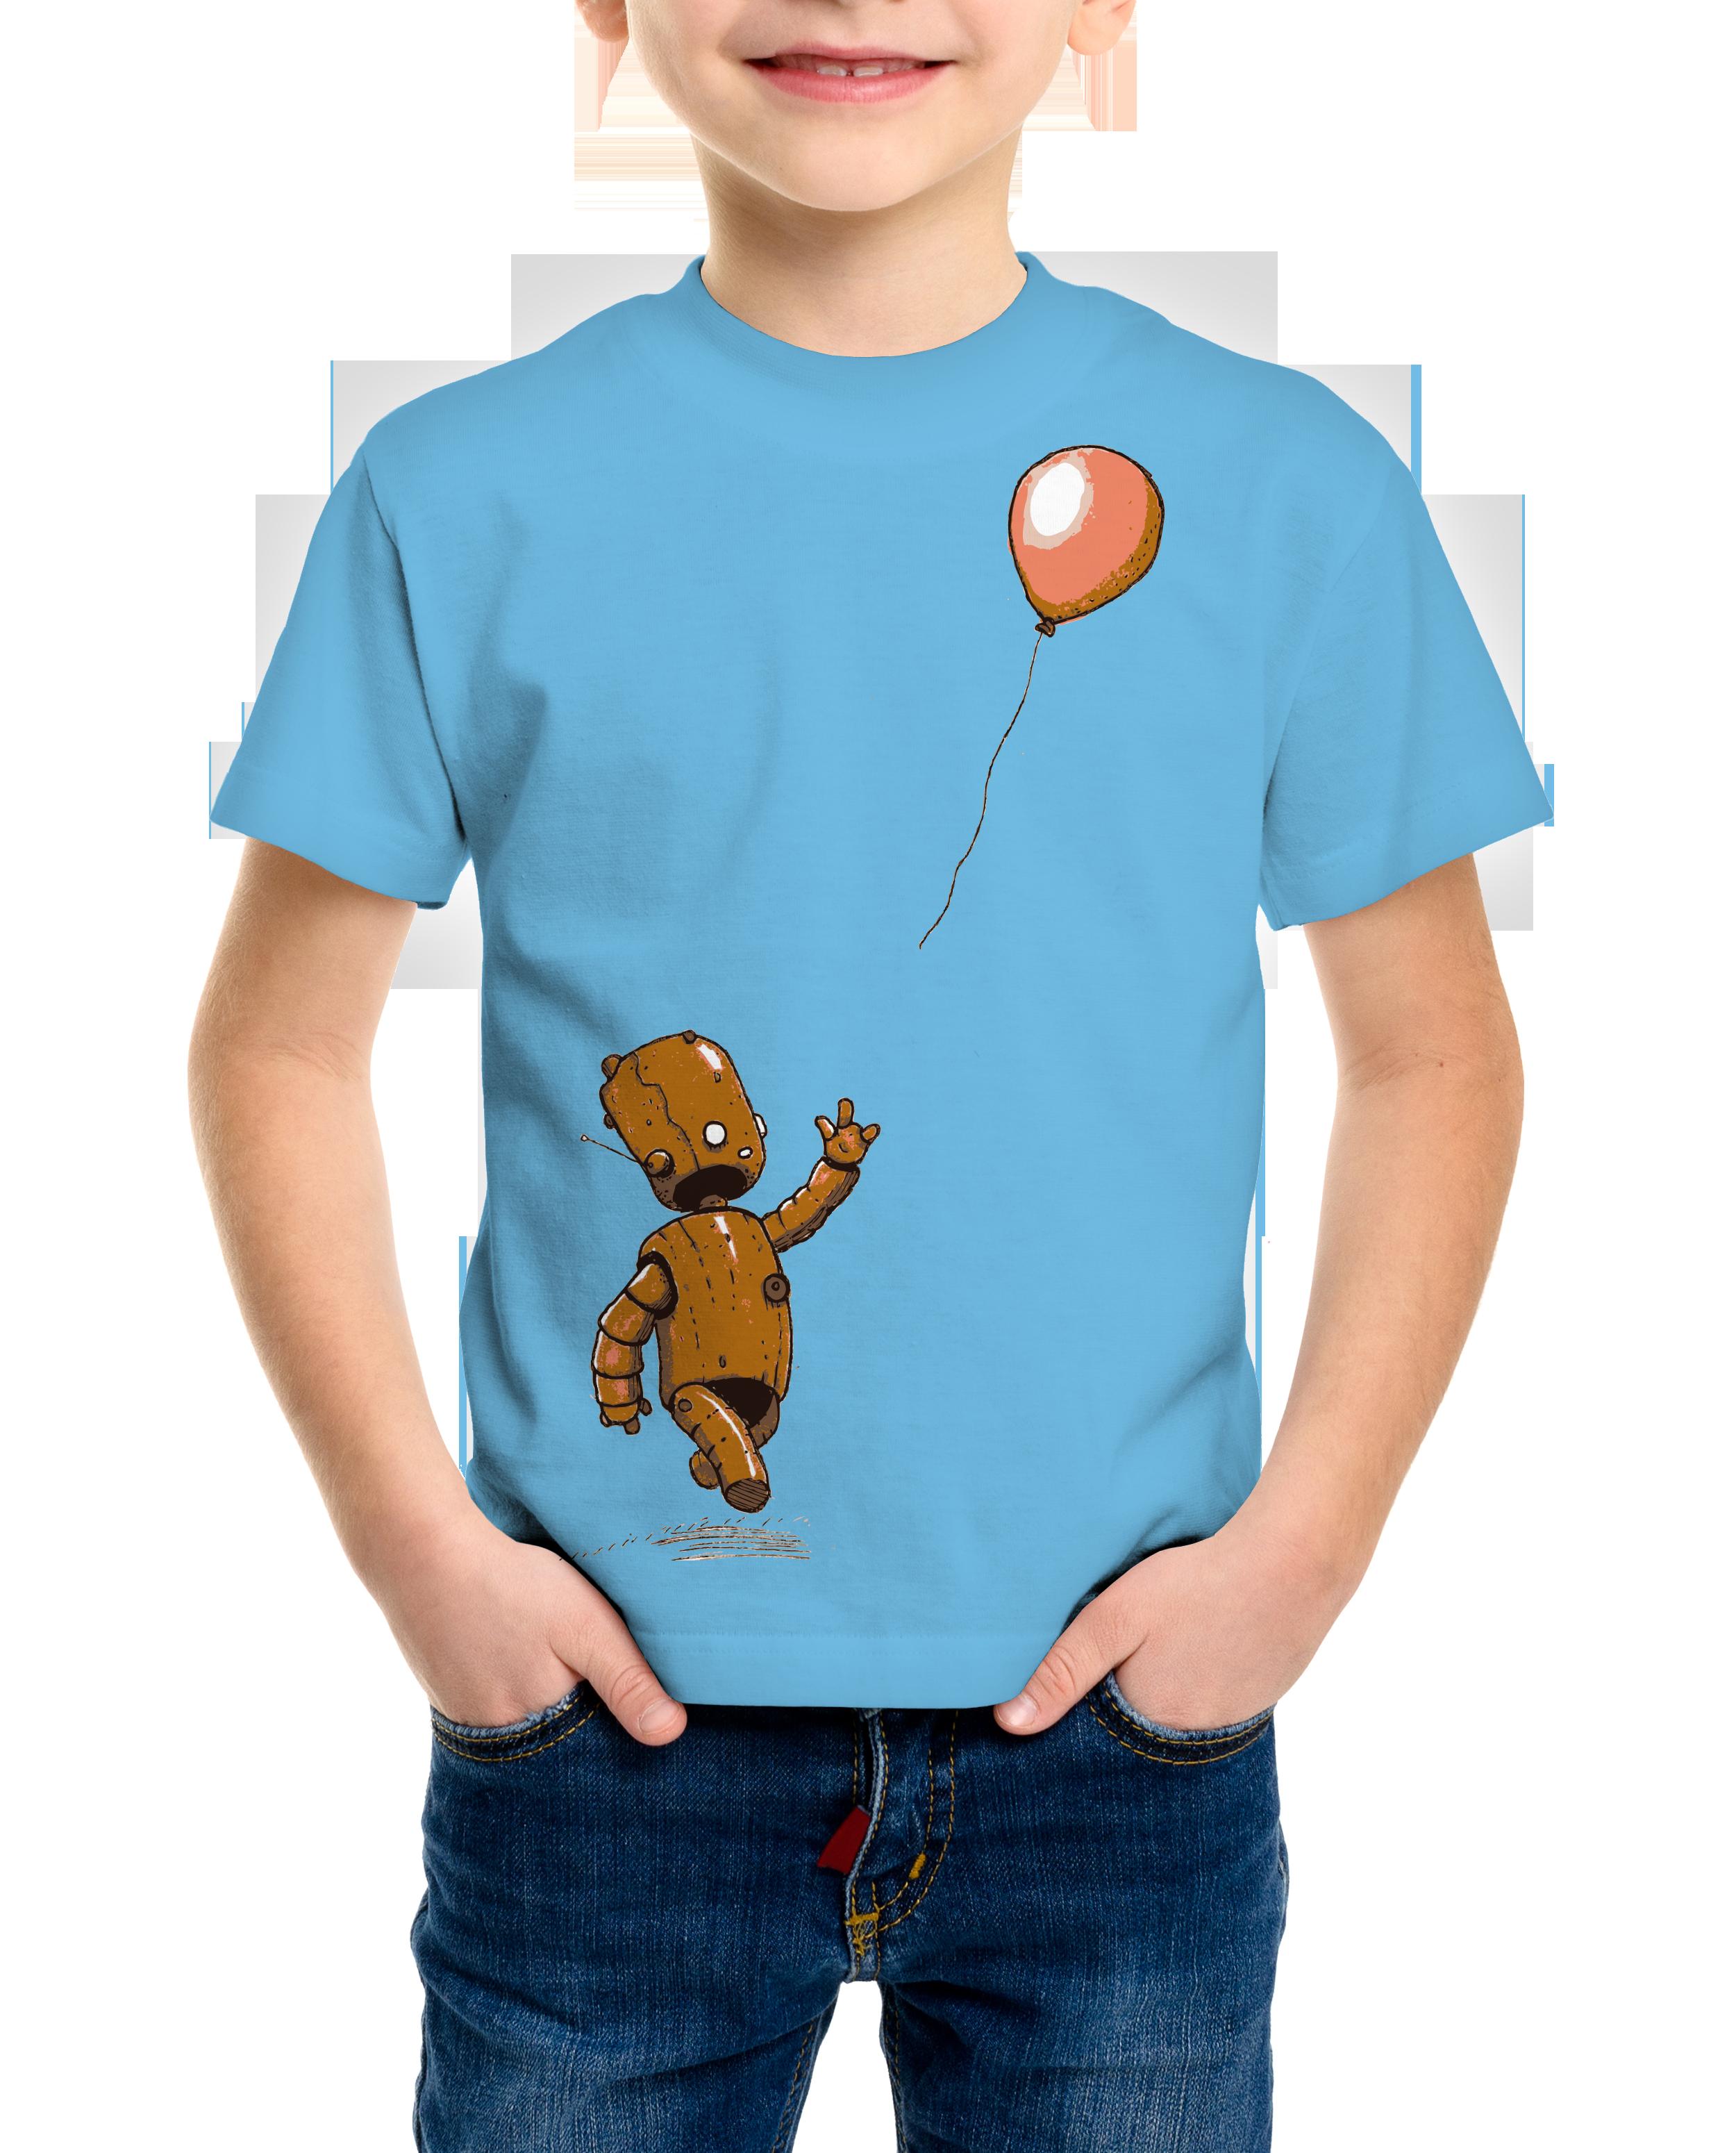 bot-balloon-shirt.png